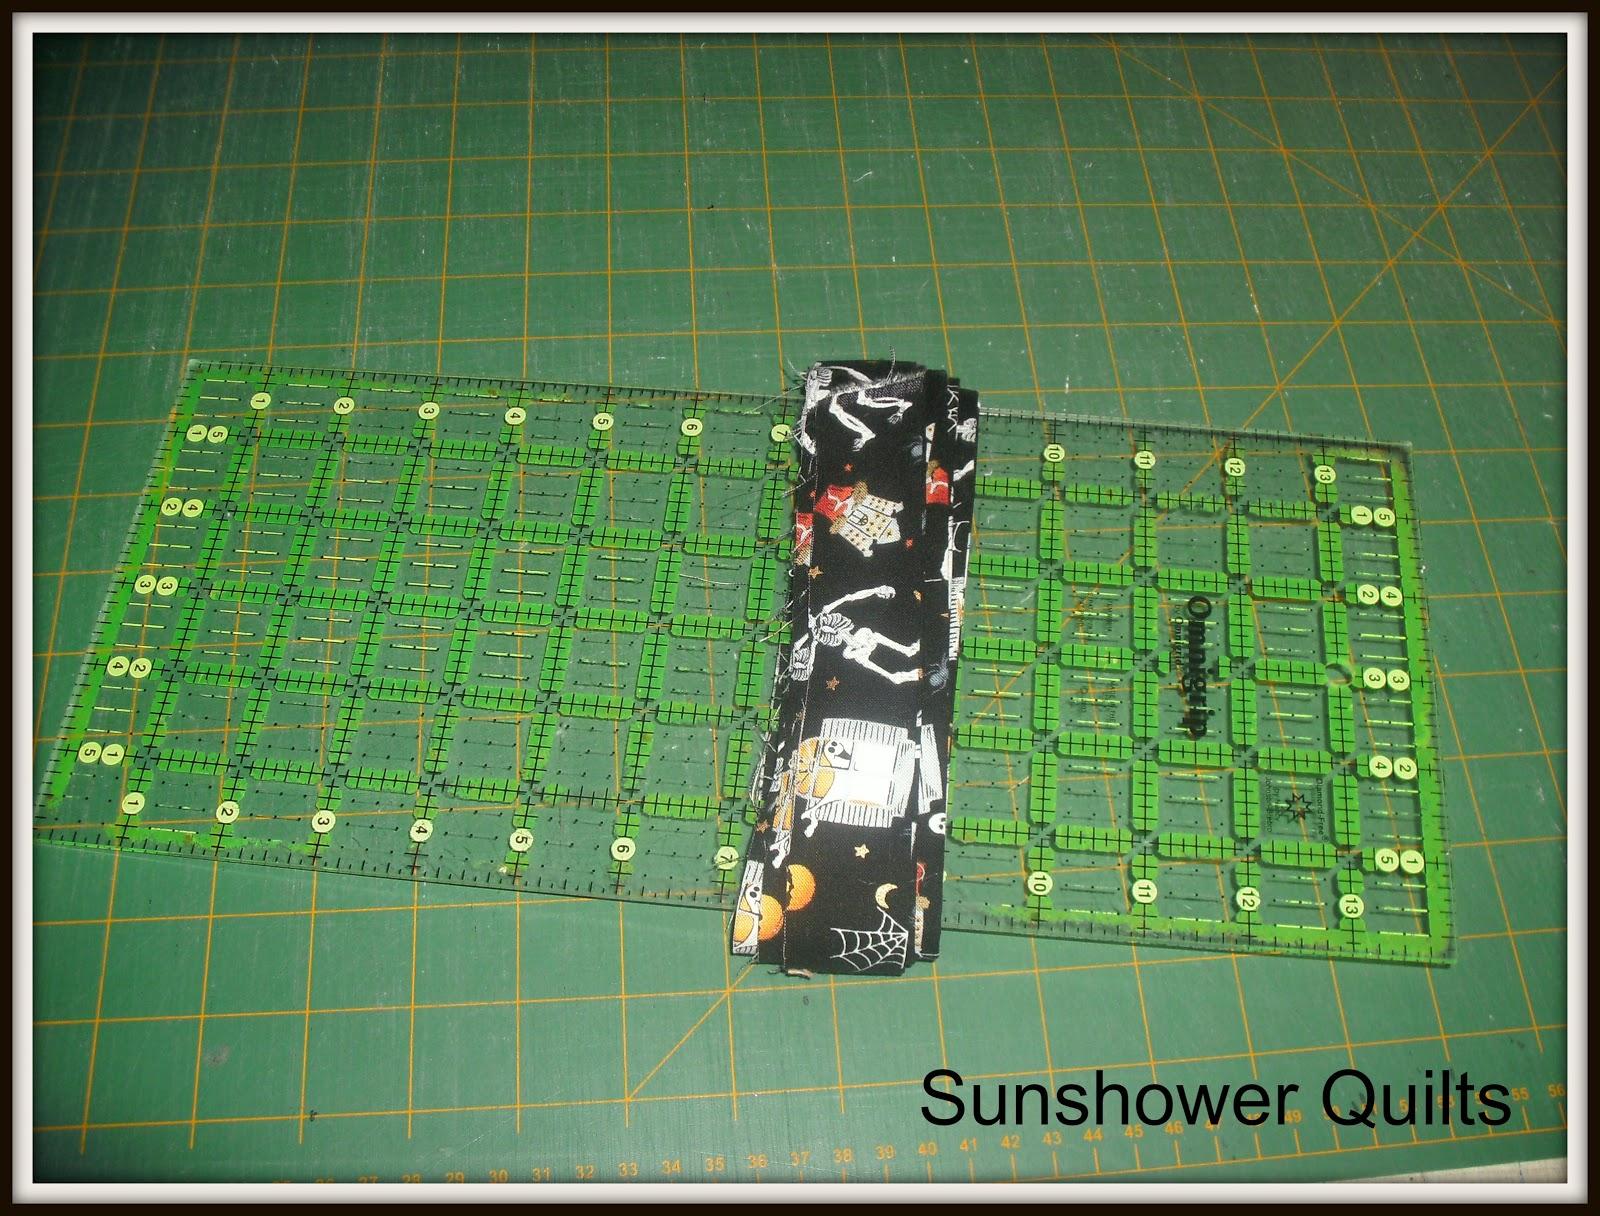 Sunshower Quilts Candy Corn Quilt! # Sunshower Goes_064641